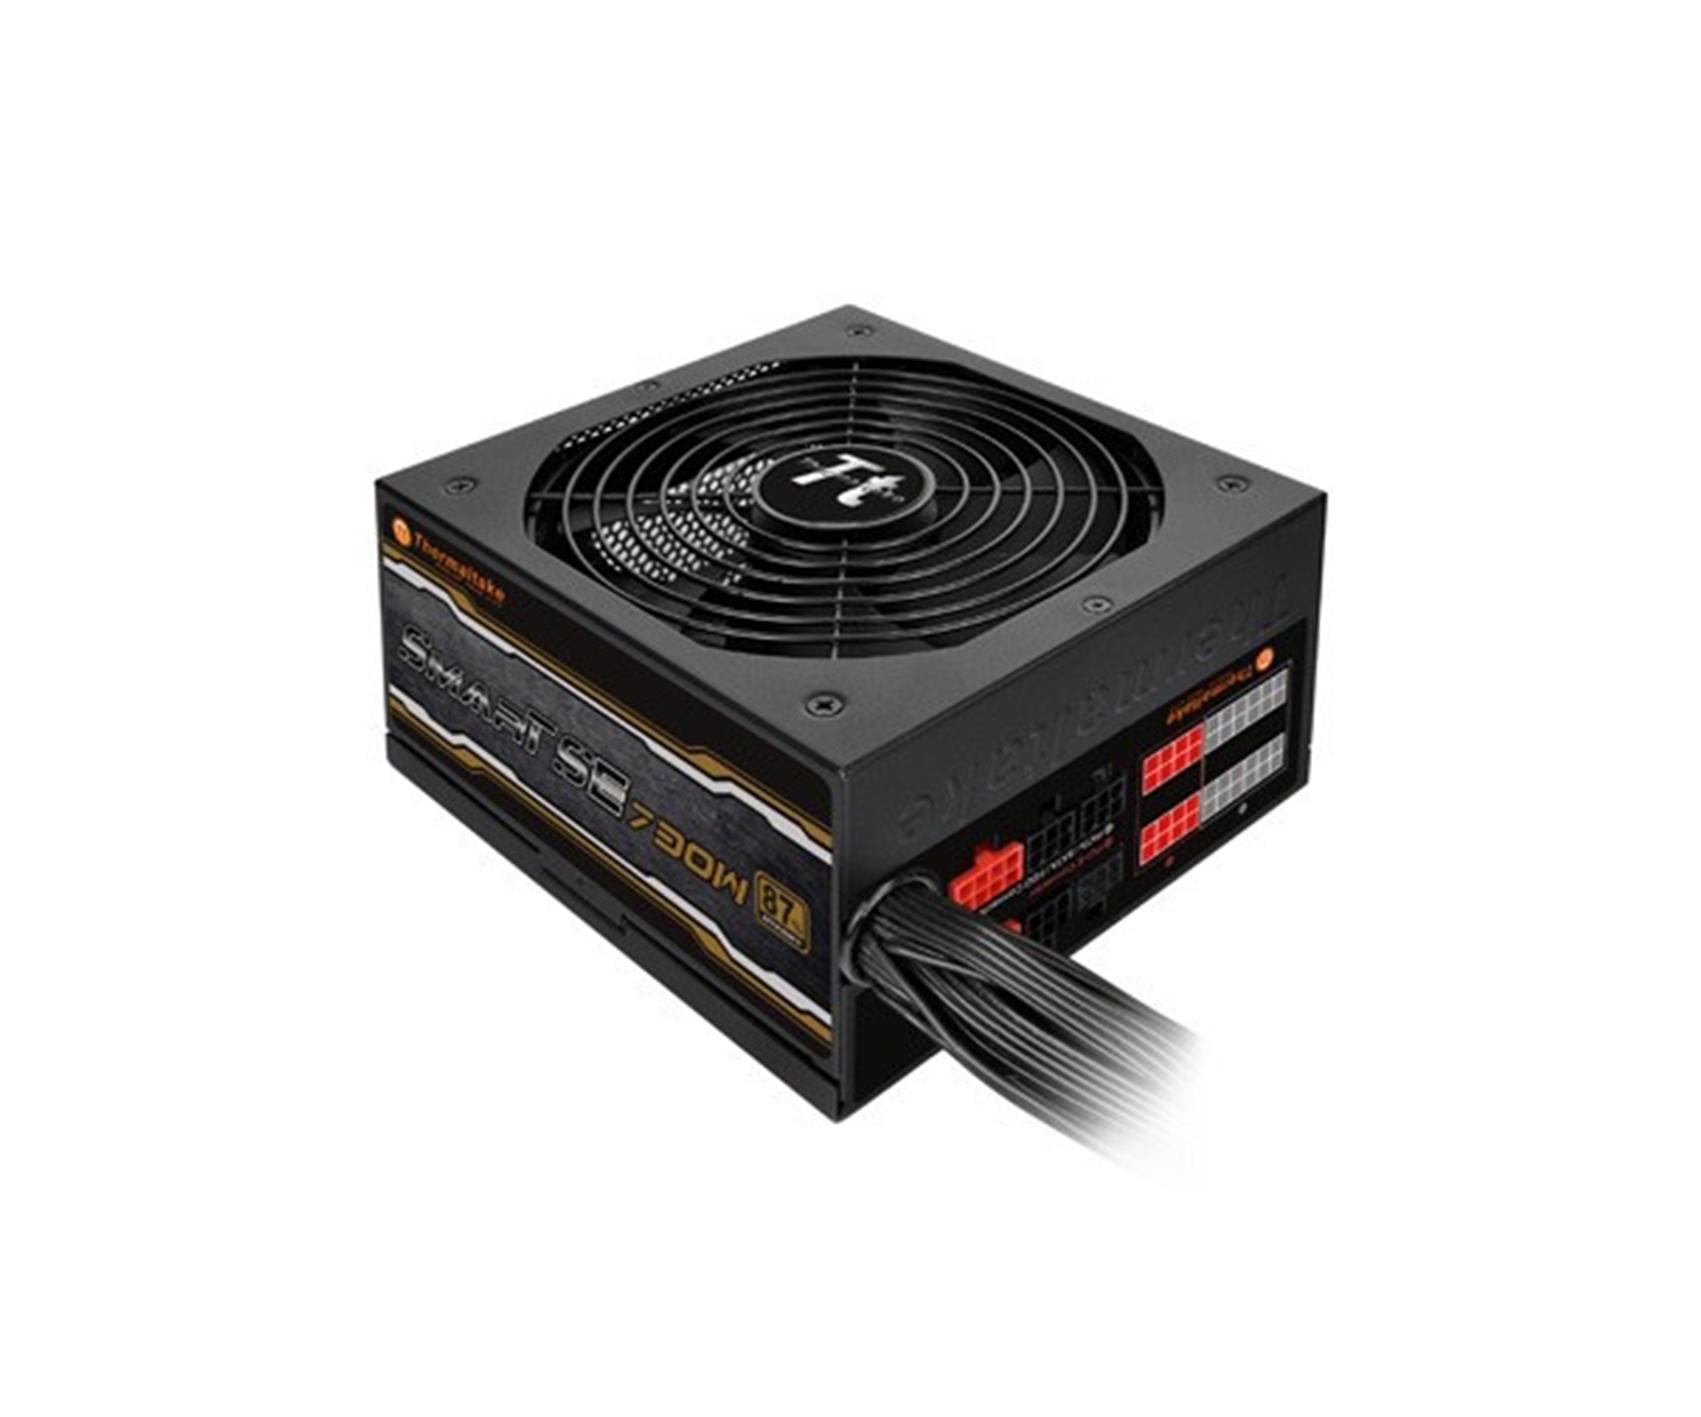 Thermaltake Smart SE 730W 87% efficiency Power Supply